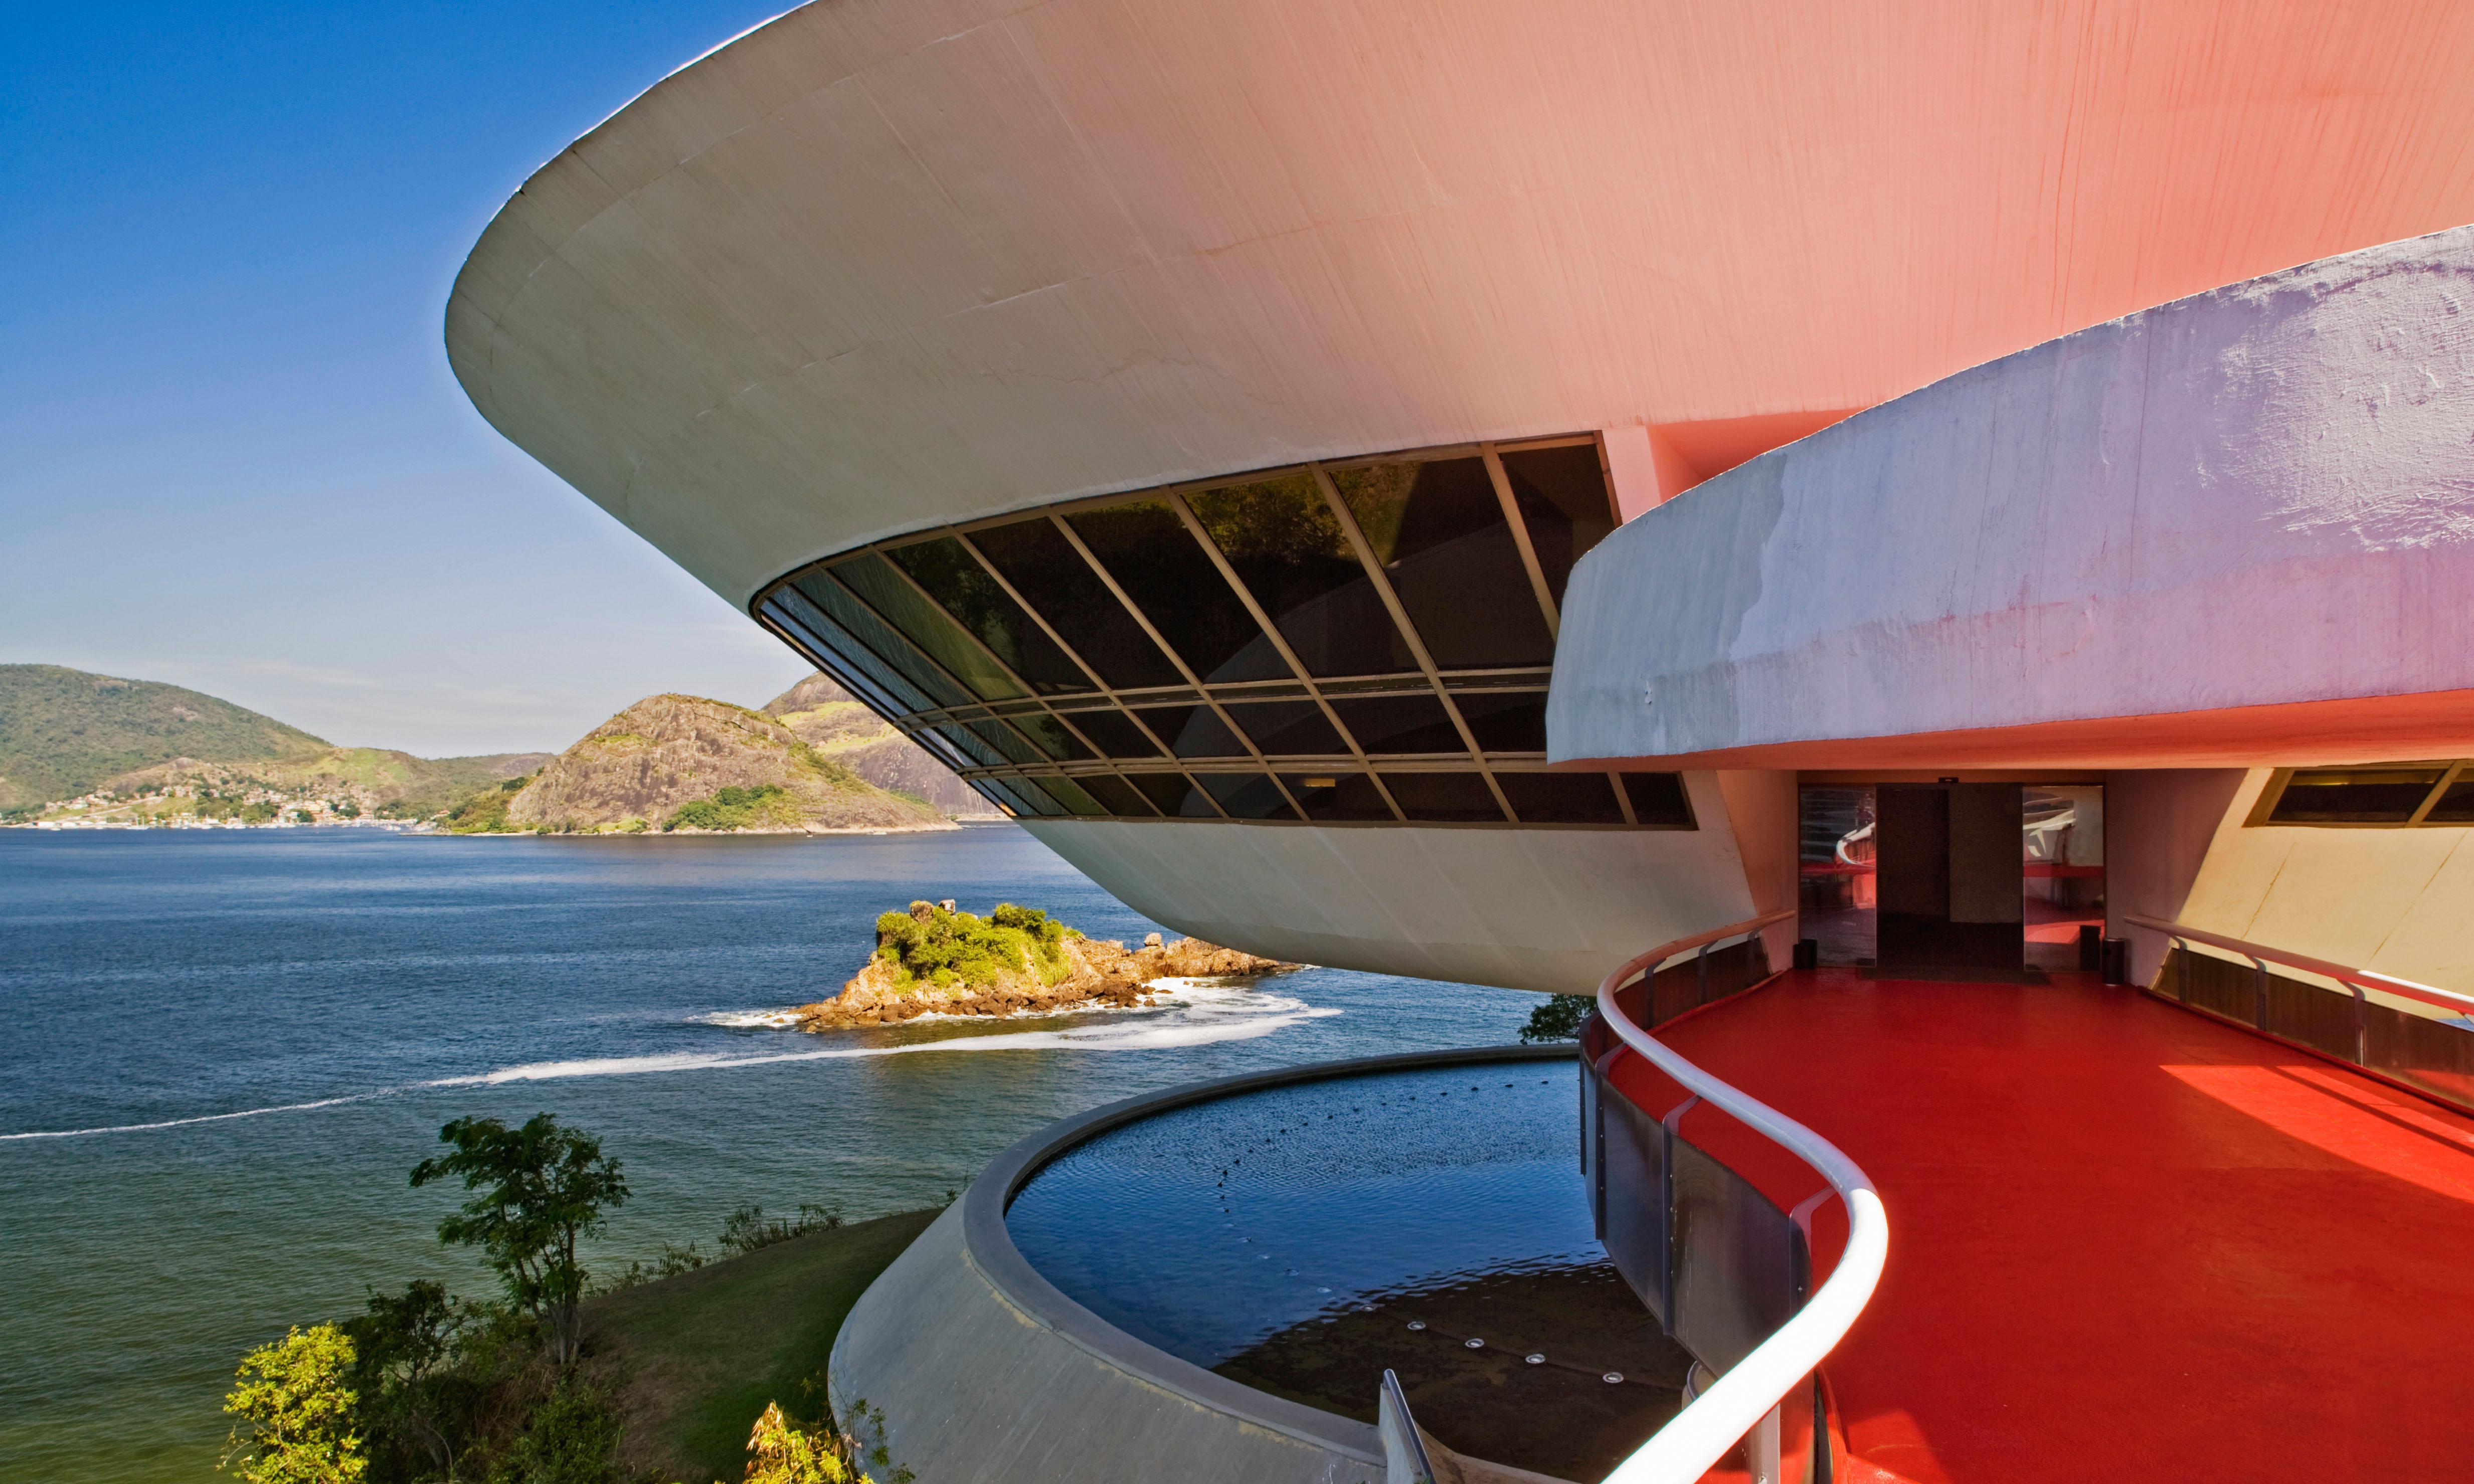 A vision in concrete: Oscar Niemeyer's Brazil